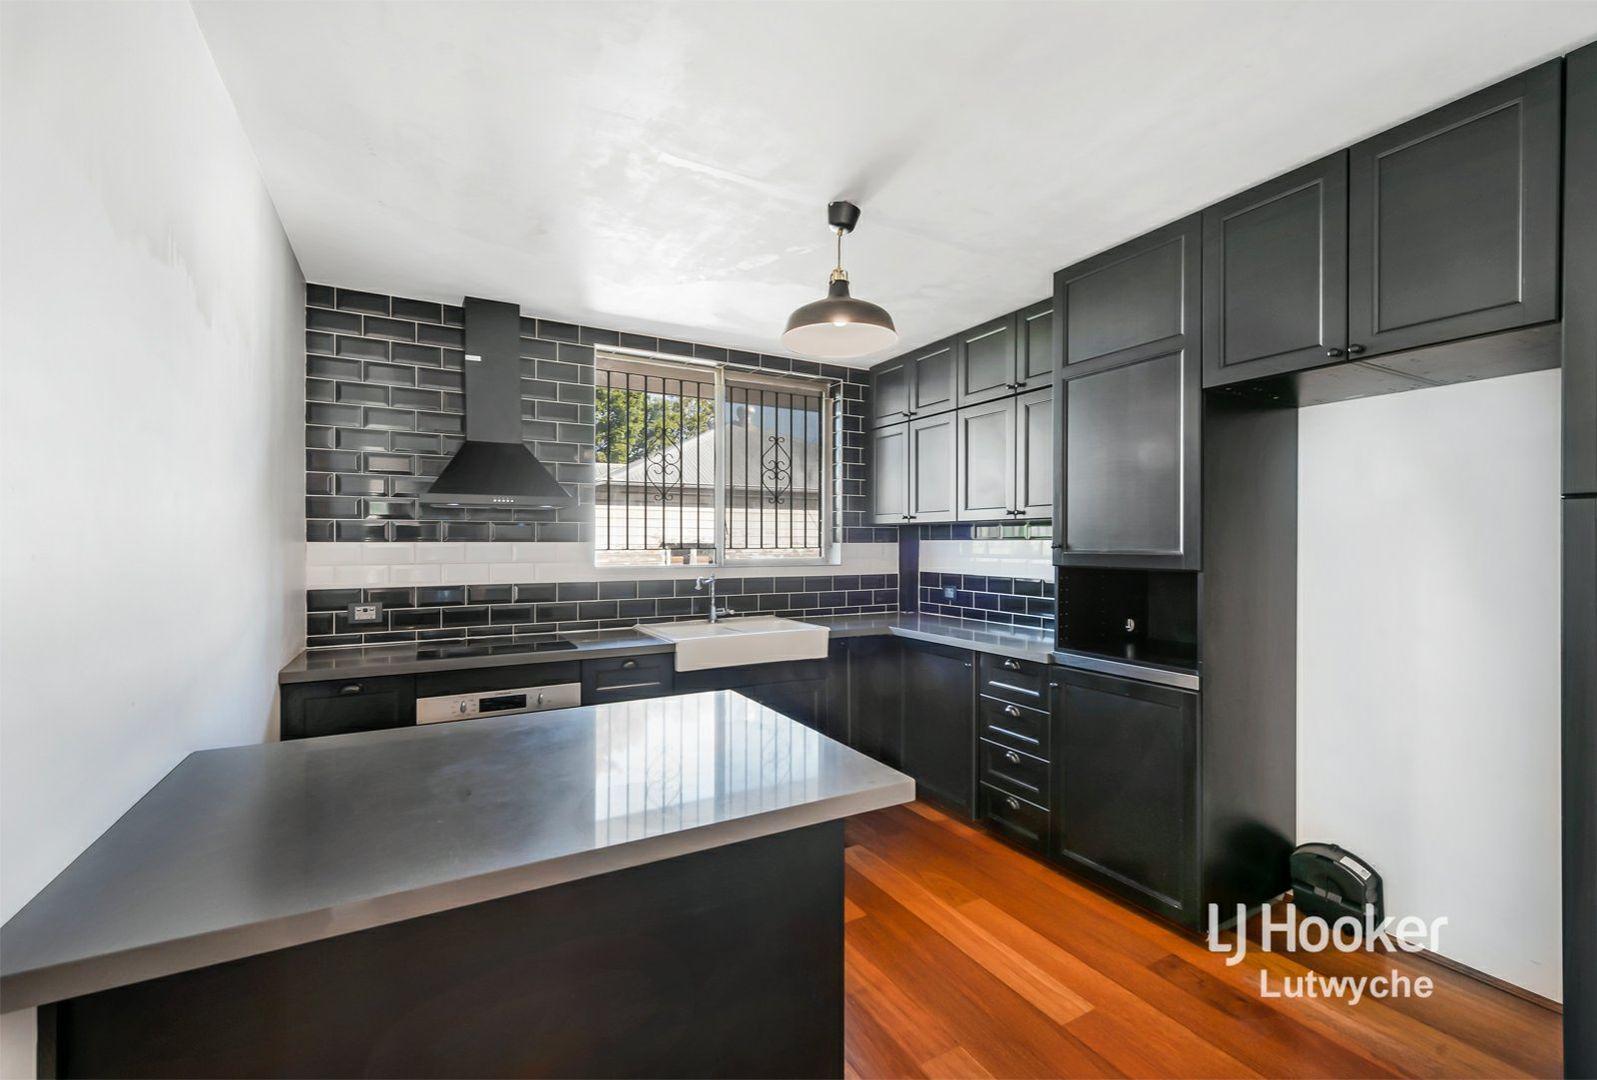 2/59 Lamington Avenue, Lutwyche QLD 4030, Image 2